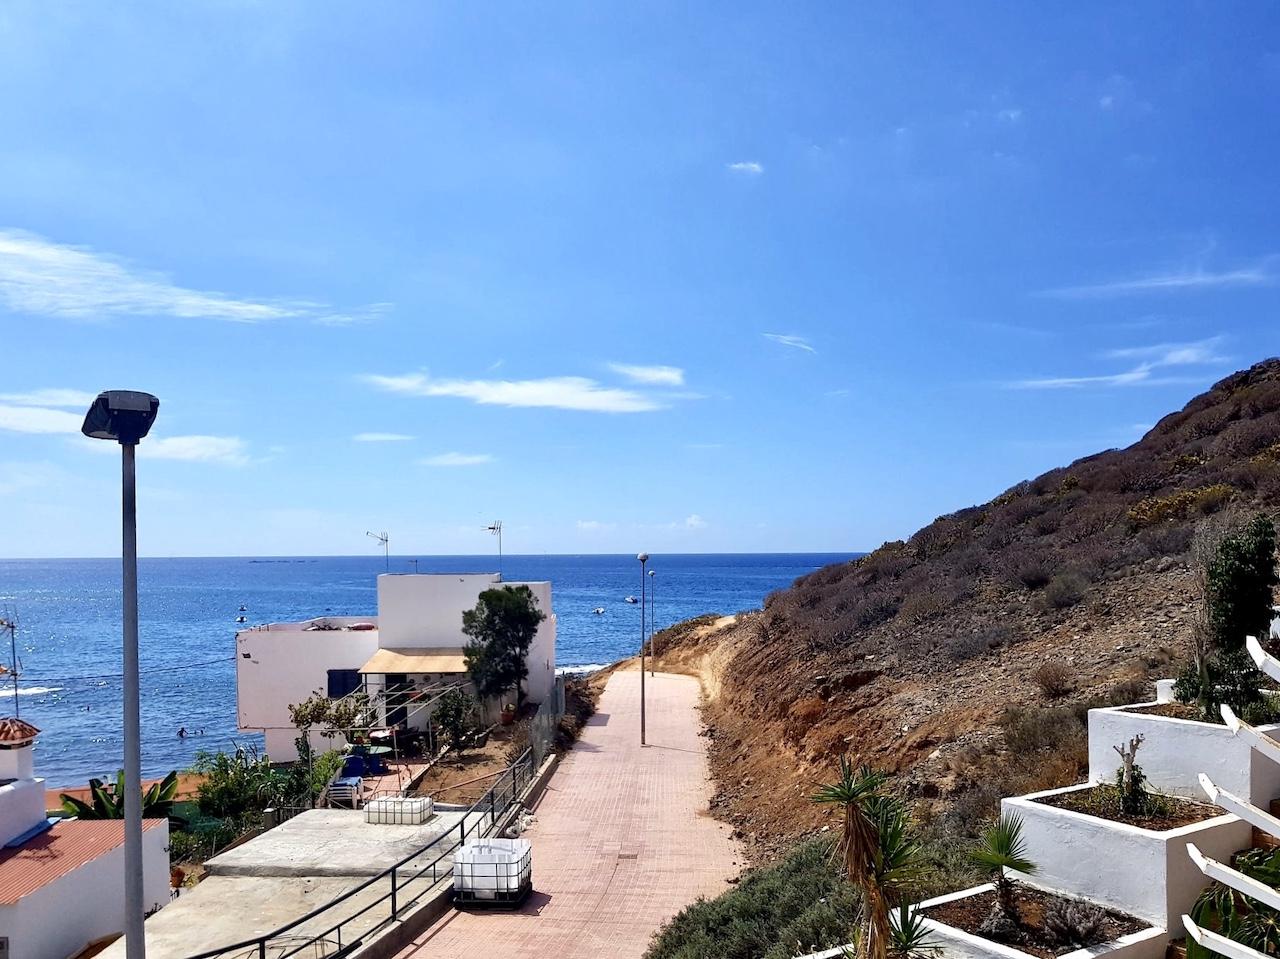 Terrassen-Maisonette in unmittelbarer Meeresnähe